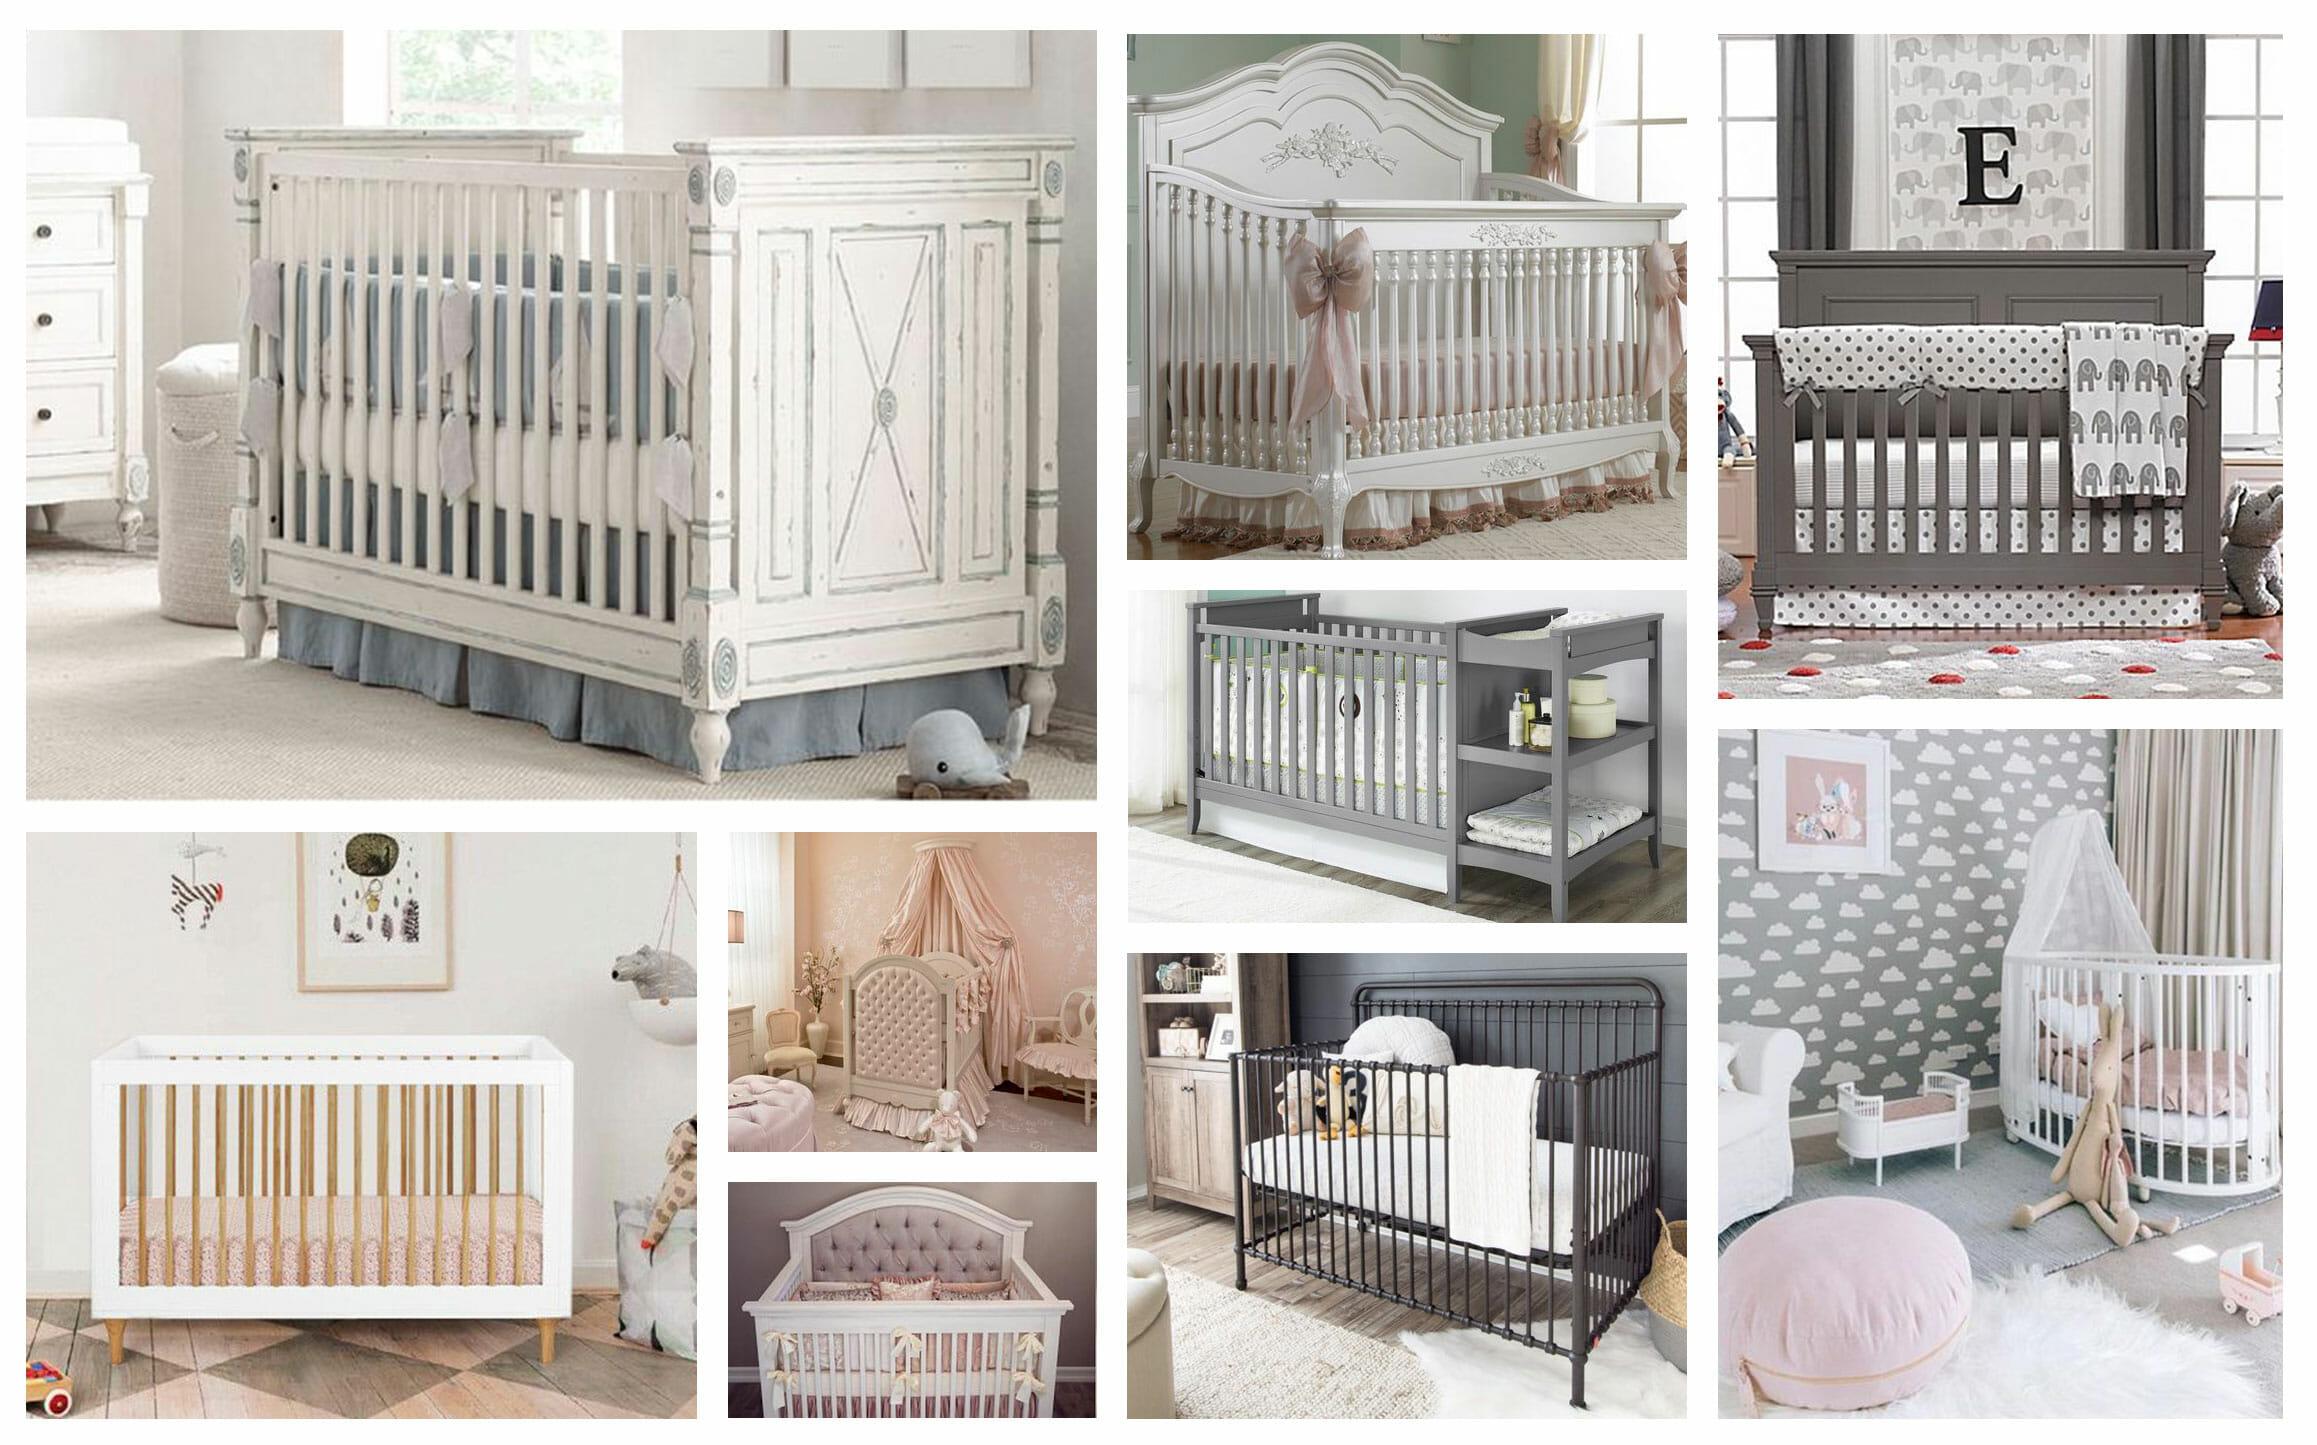 nursey-2-cribs